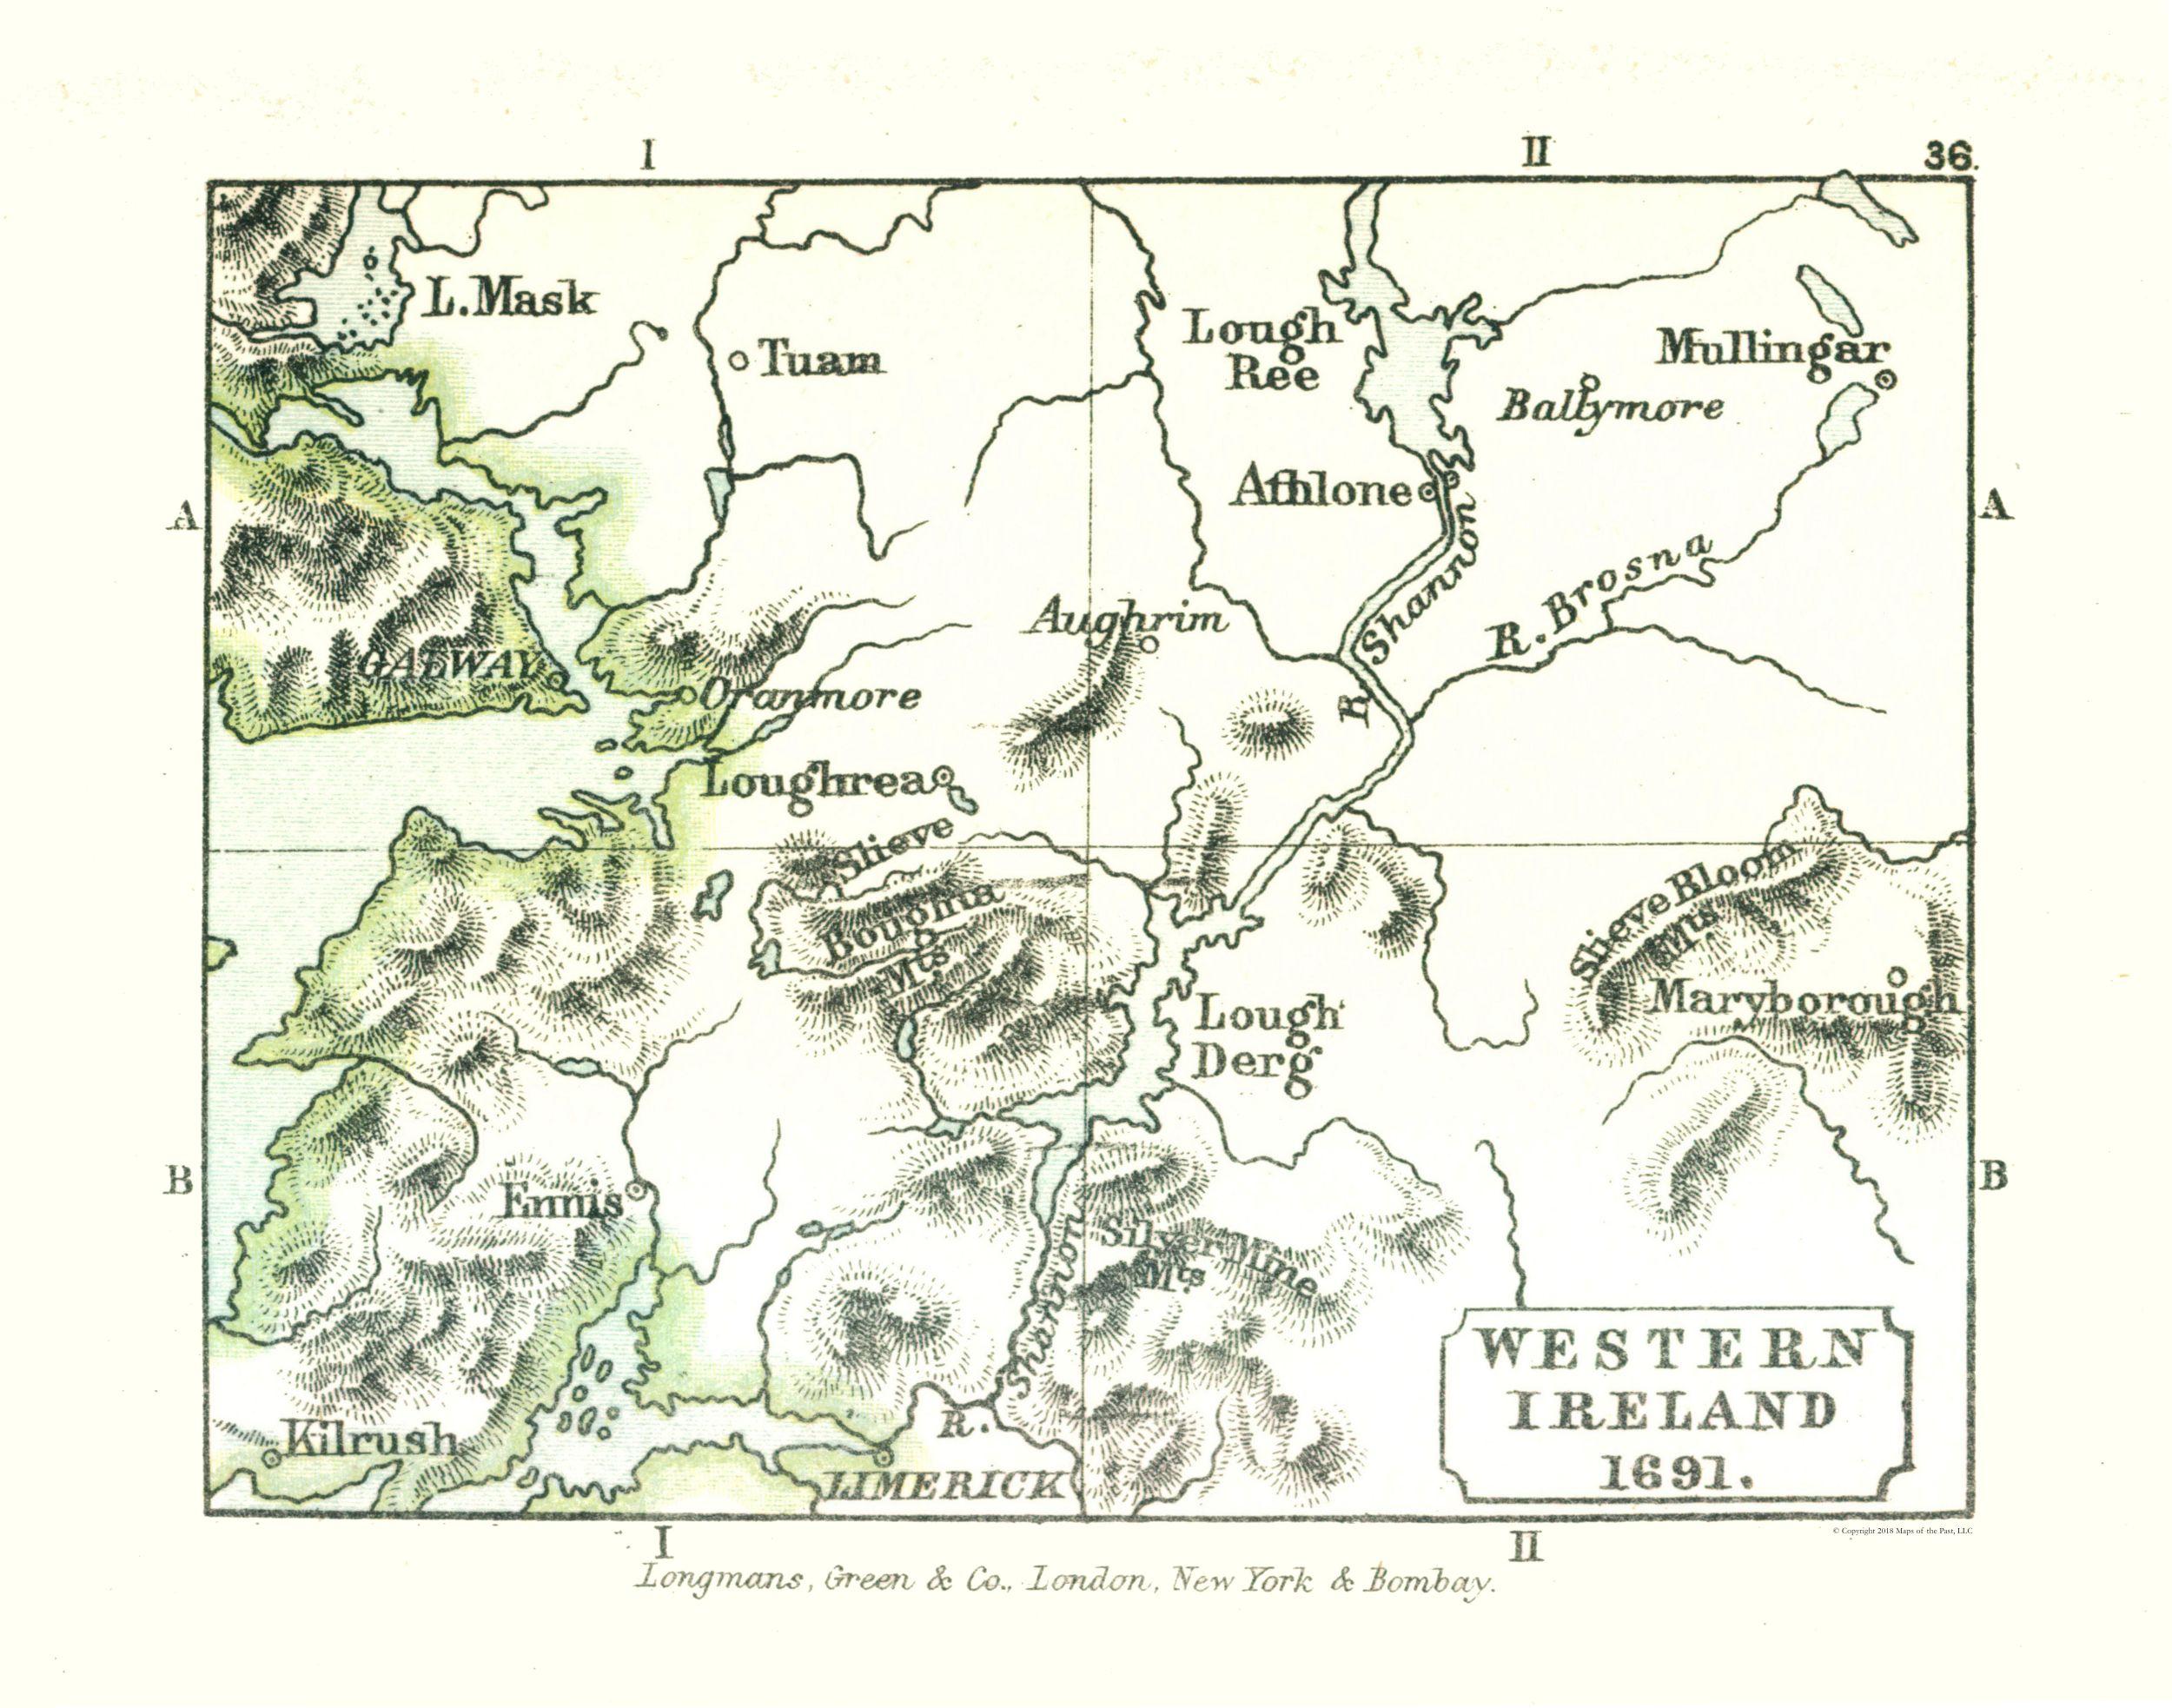 Map Of Ireland To New York.Old Ireland Map Western Ireland In 1691 Gardiner 1902 29 25 X 23